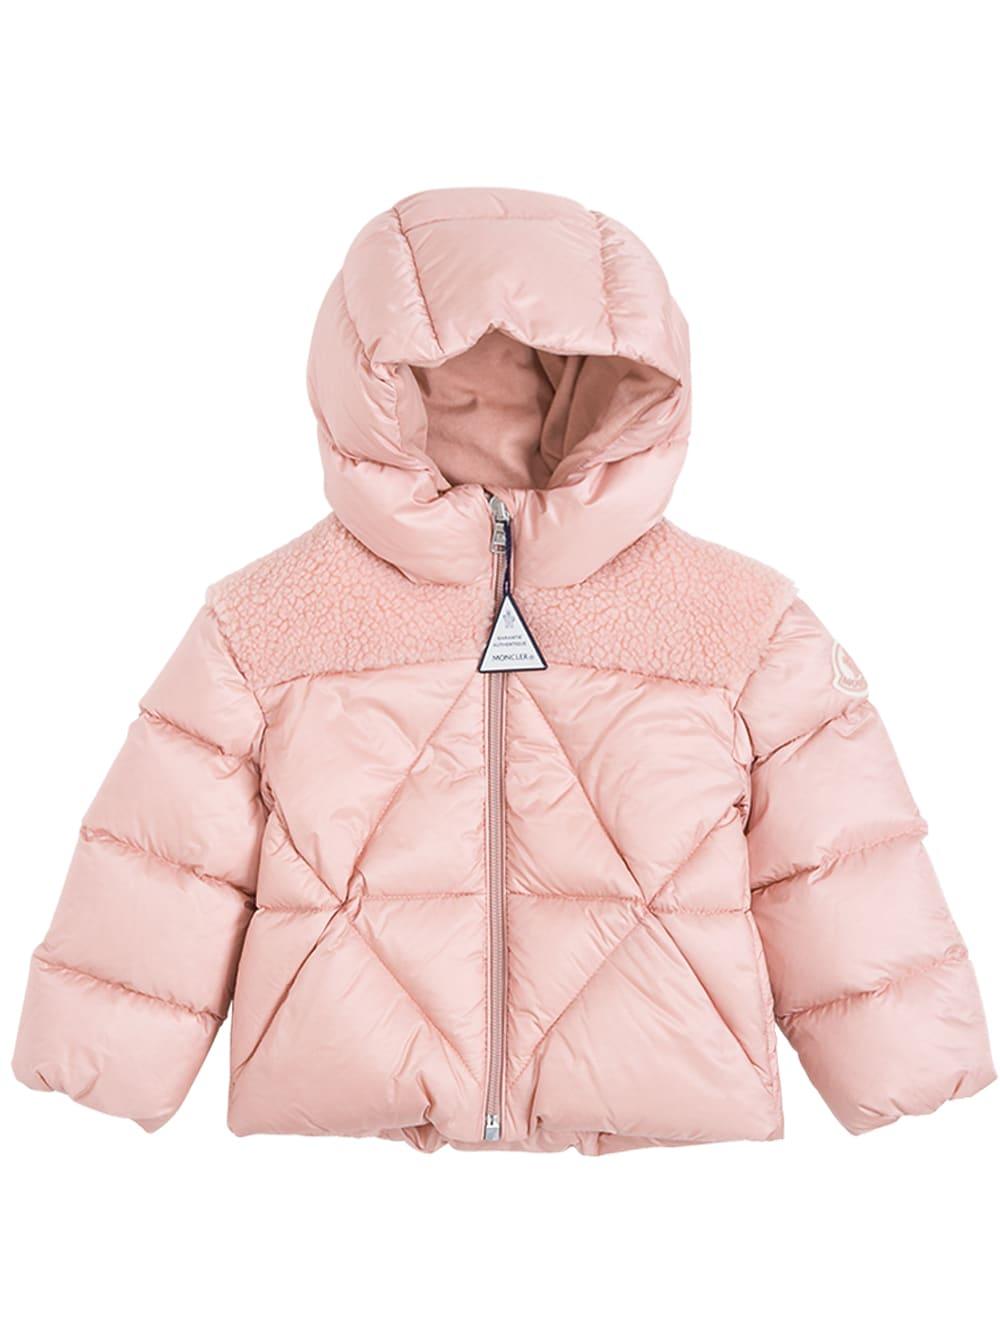 Moncler Pink Arabette Nylon Down Jacket With Teddy Insert